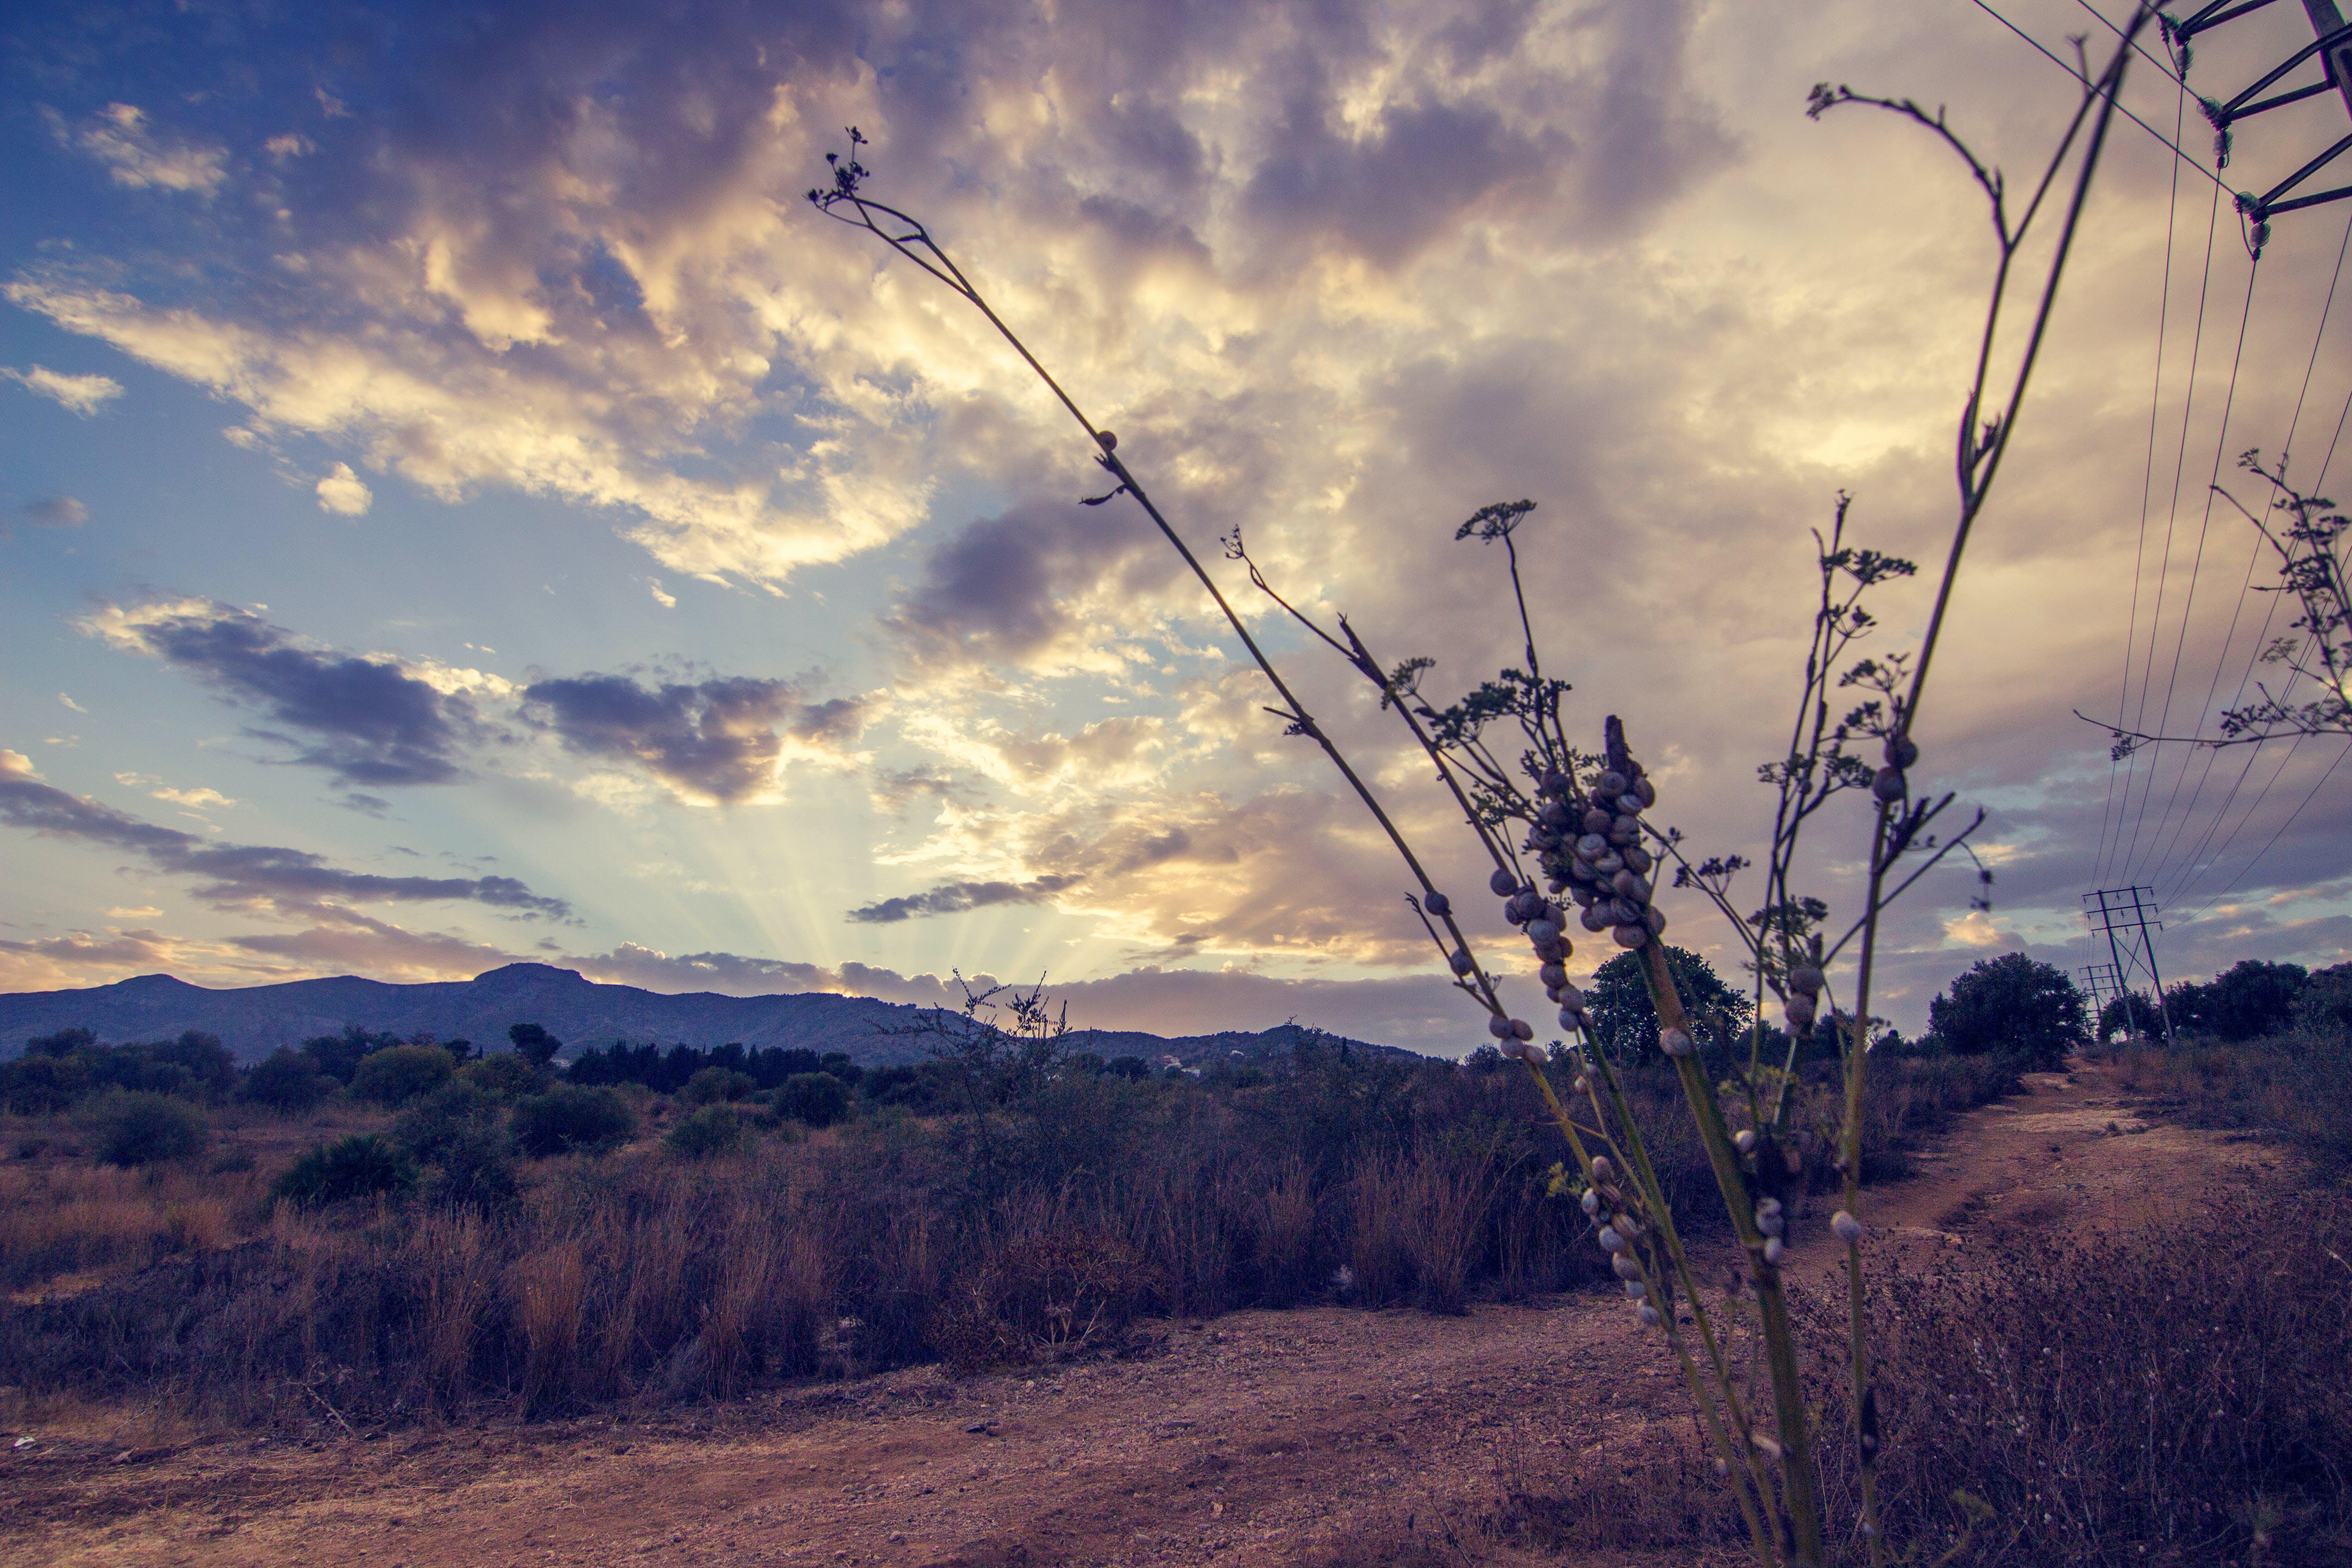 Fotos de stock gratuitas de cielo, naturaleza, nubes, plantas